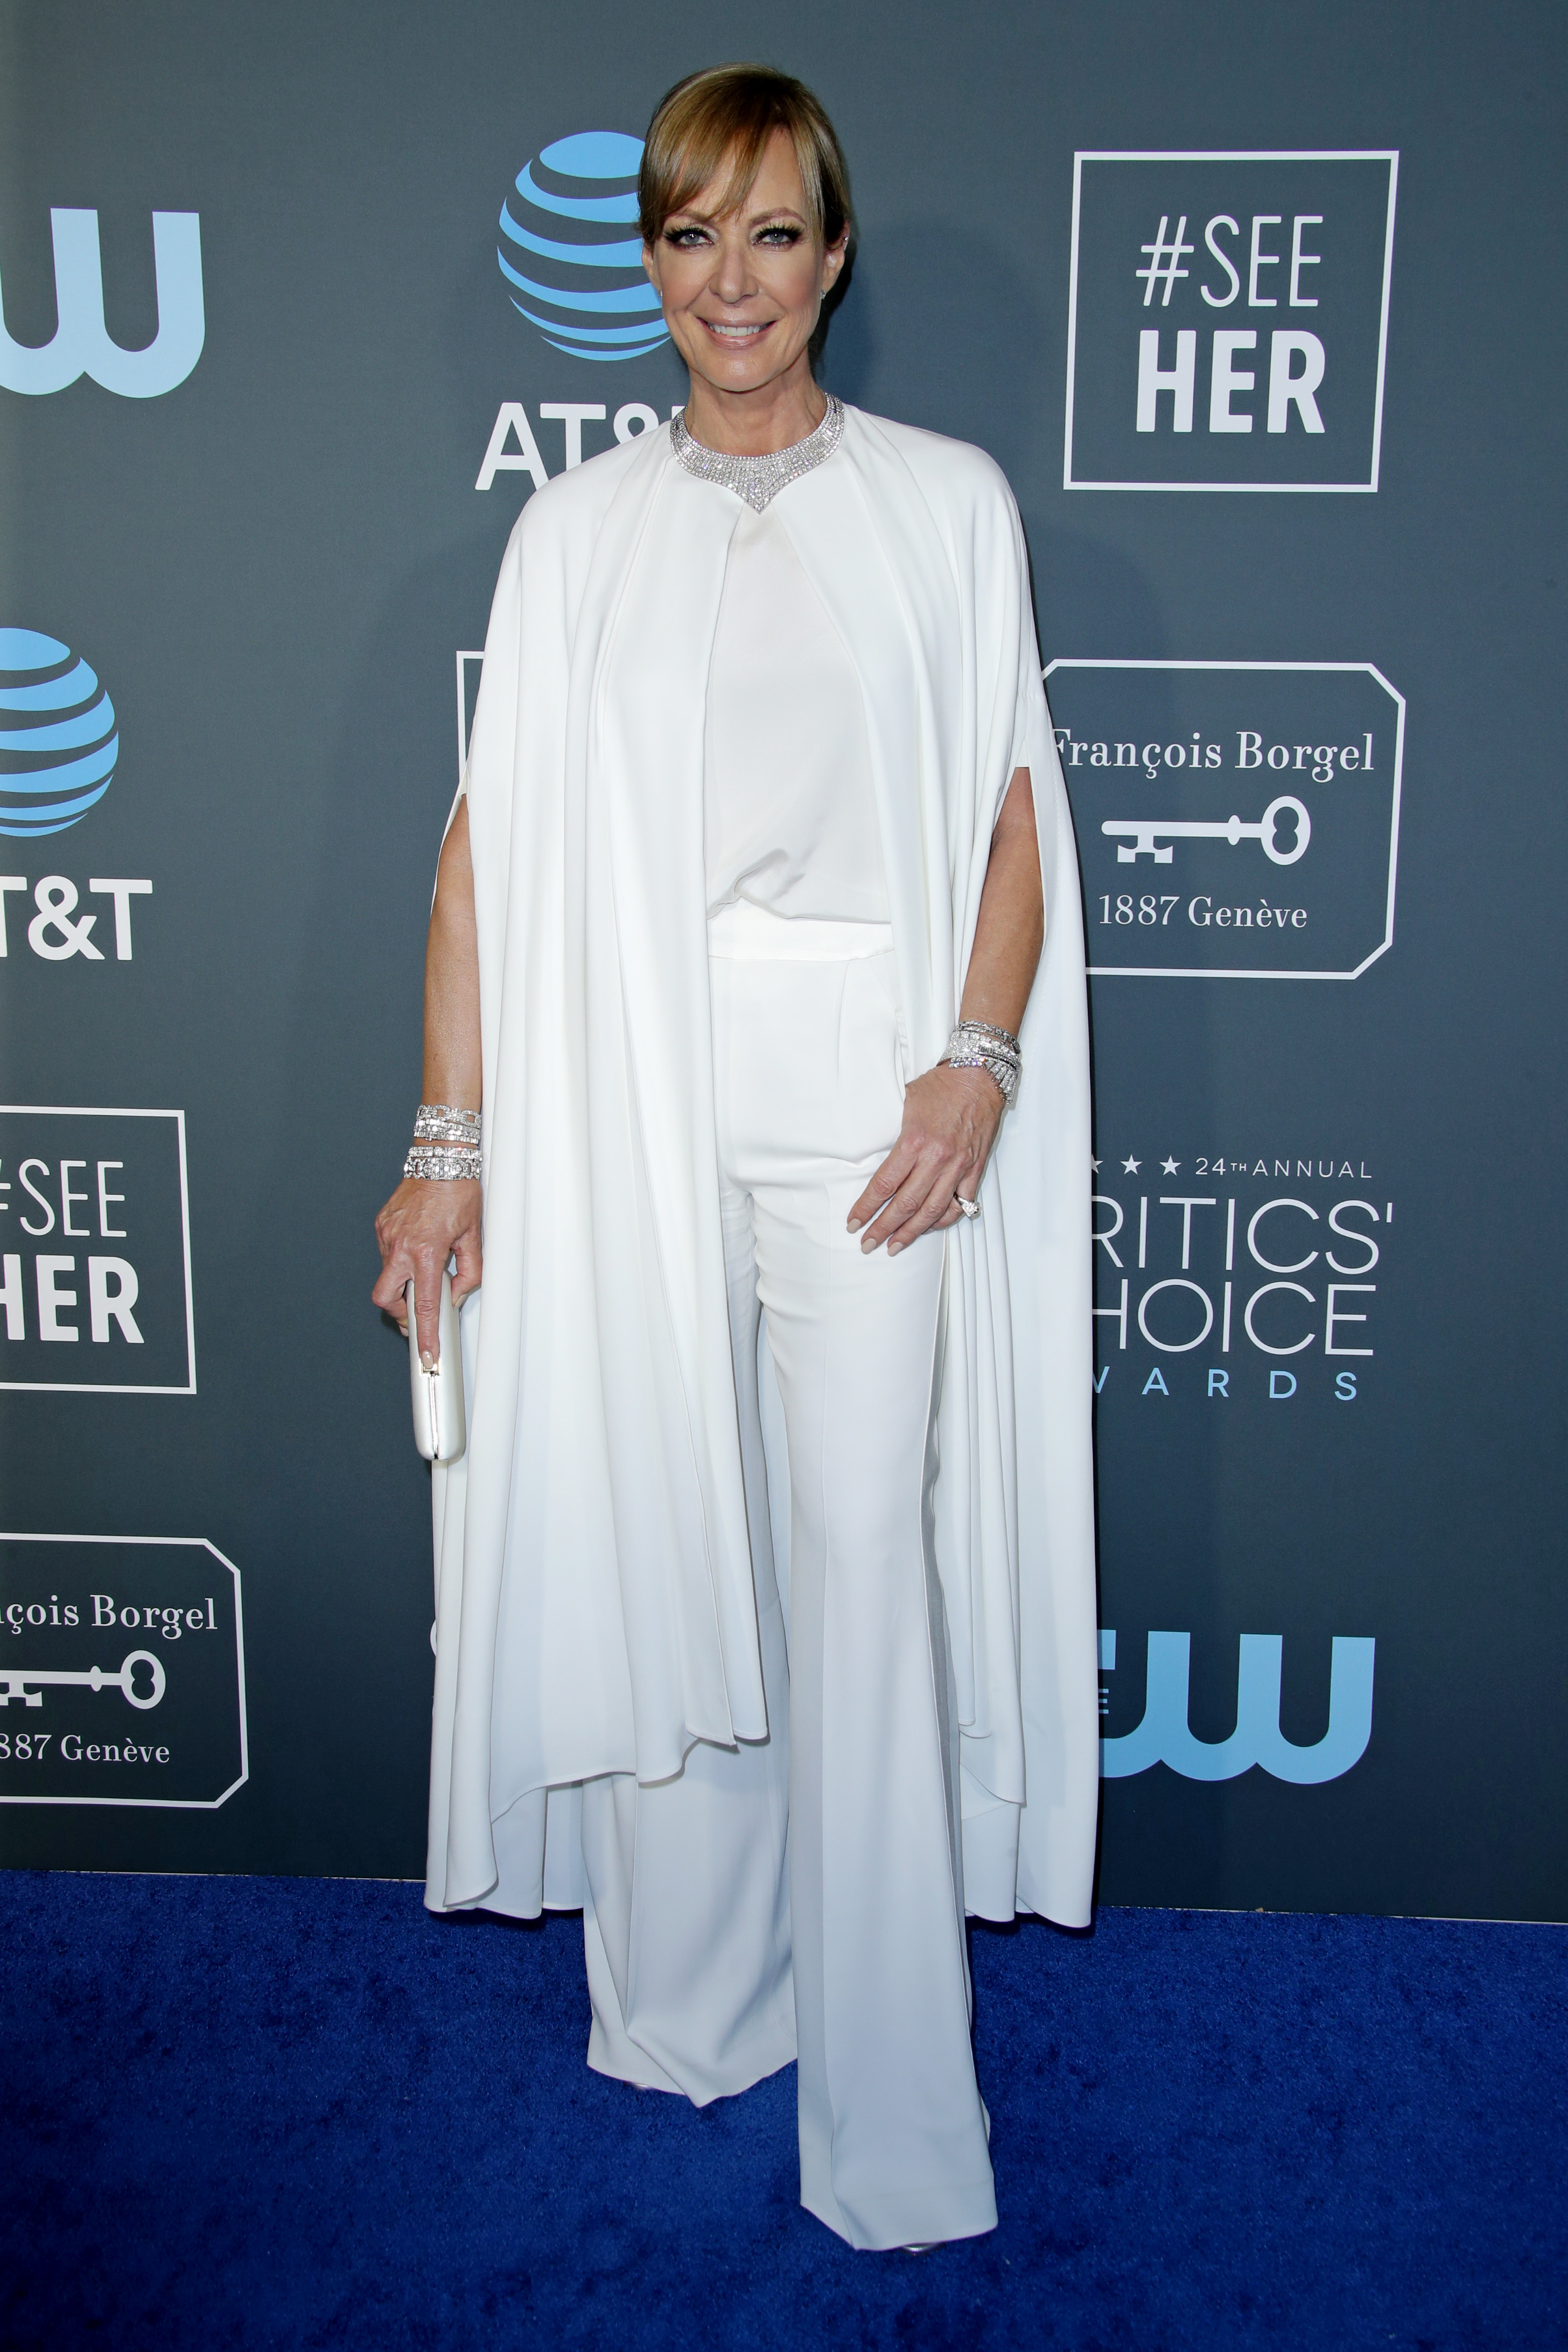 Allison Janney attends the 24th Annual Critics' Choice Awards at Barker Hanger in Santa Monica, California, on Jan. 13, 2019.